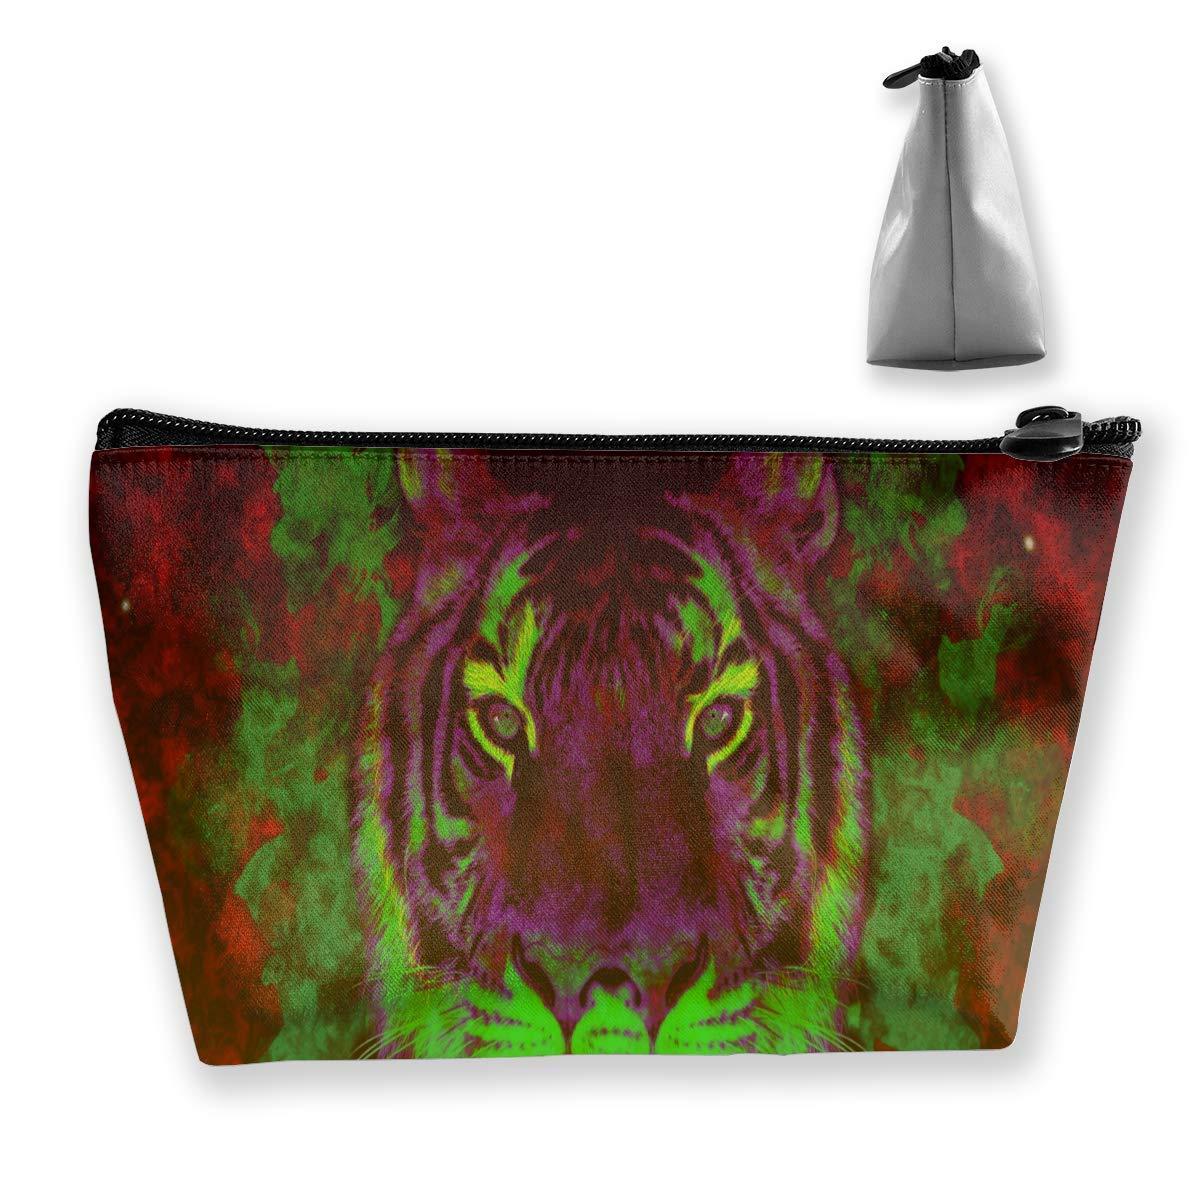 Trippy Abstract Tiger Travel Toiletry Bag Estuches de ...